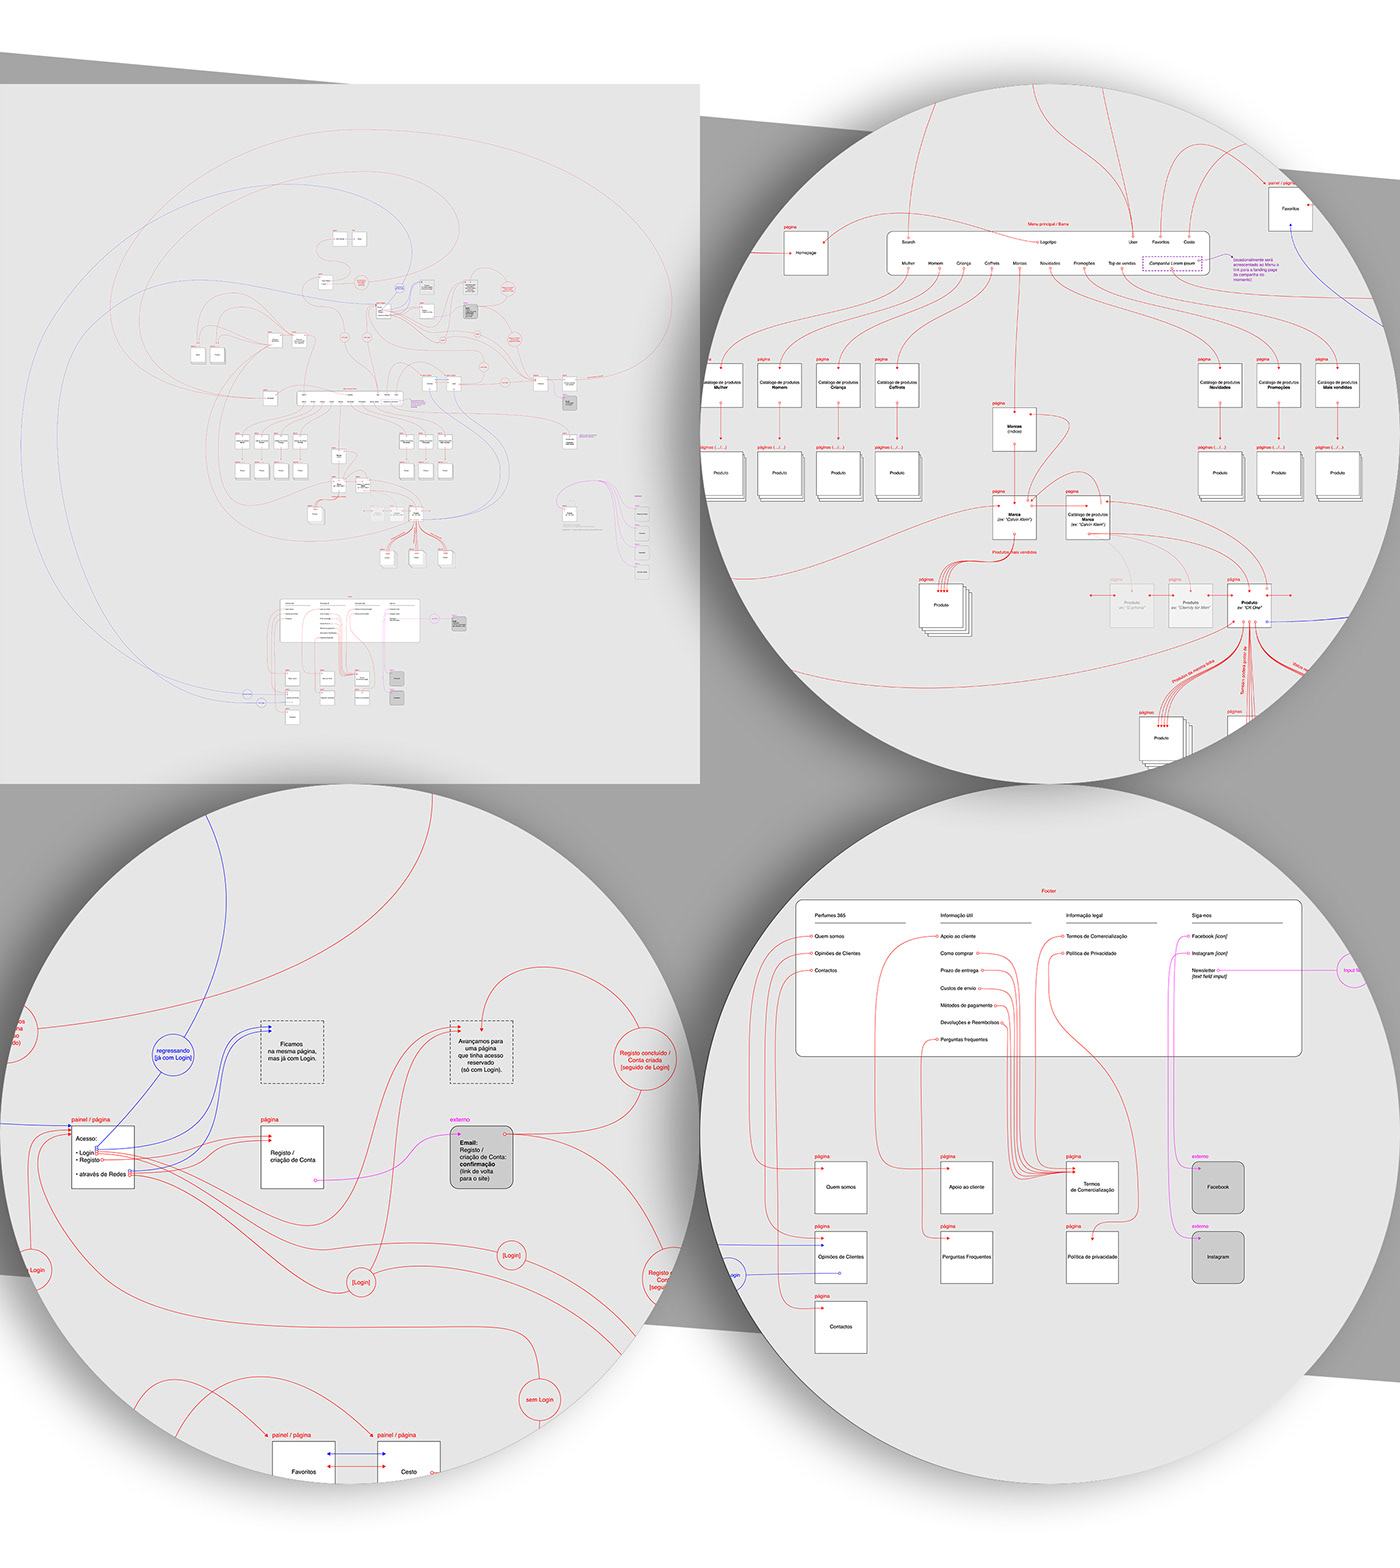 Communication Design copywriting  Digital product design graphic design  interaction Style Guide User Experience Design user interface design ux/ui design Web